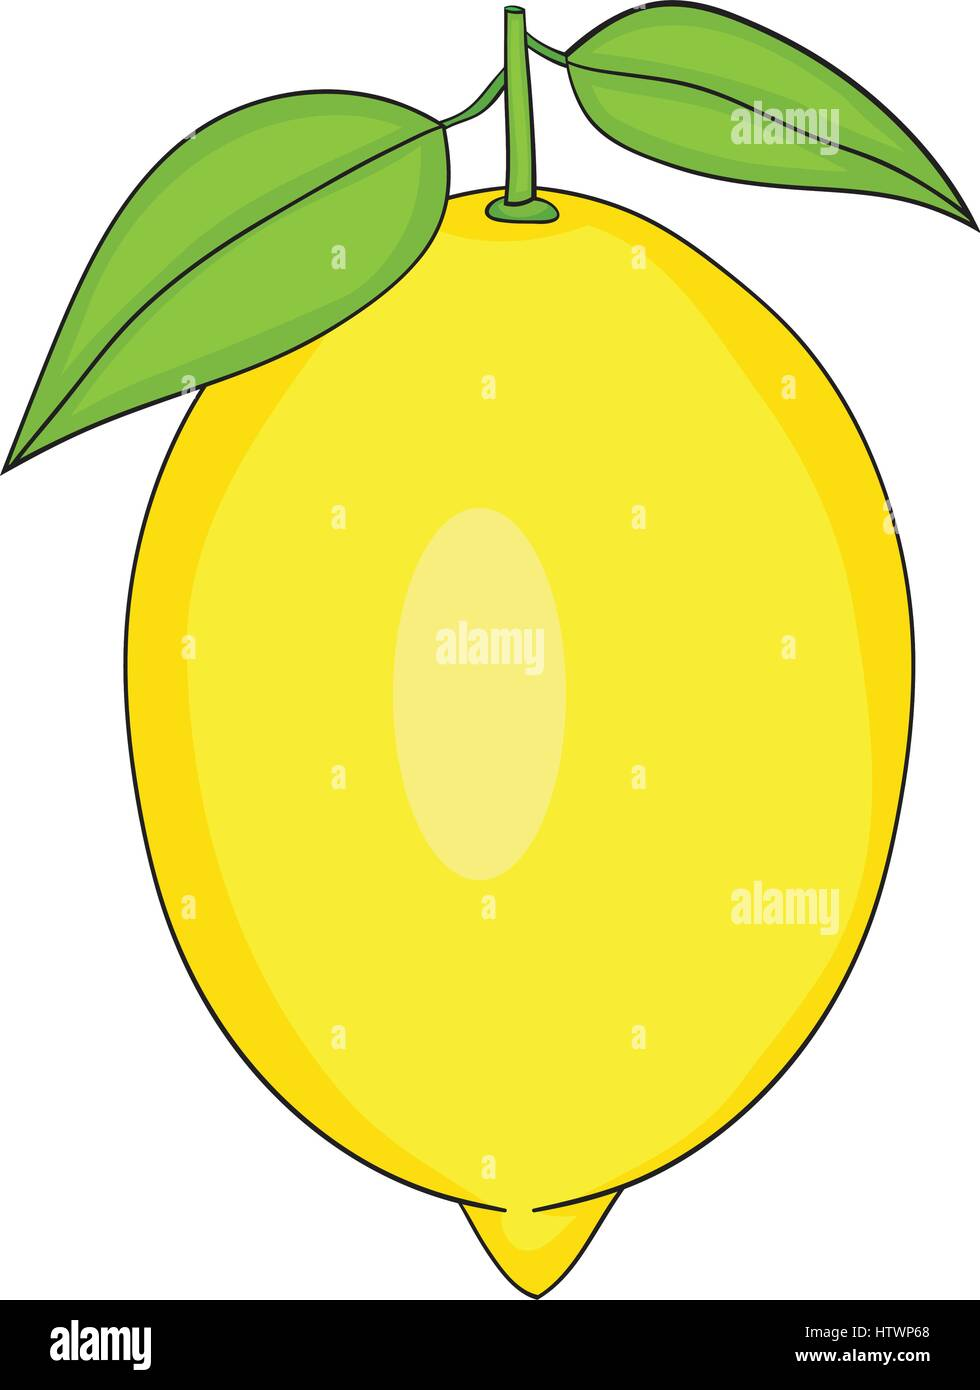 Limón GIF - Lemon Dance Cartoon - Discover & Share GIFs